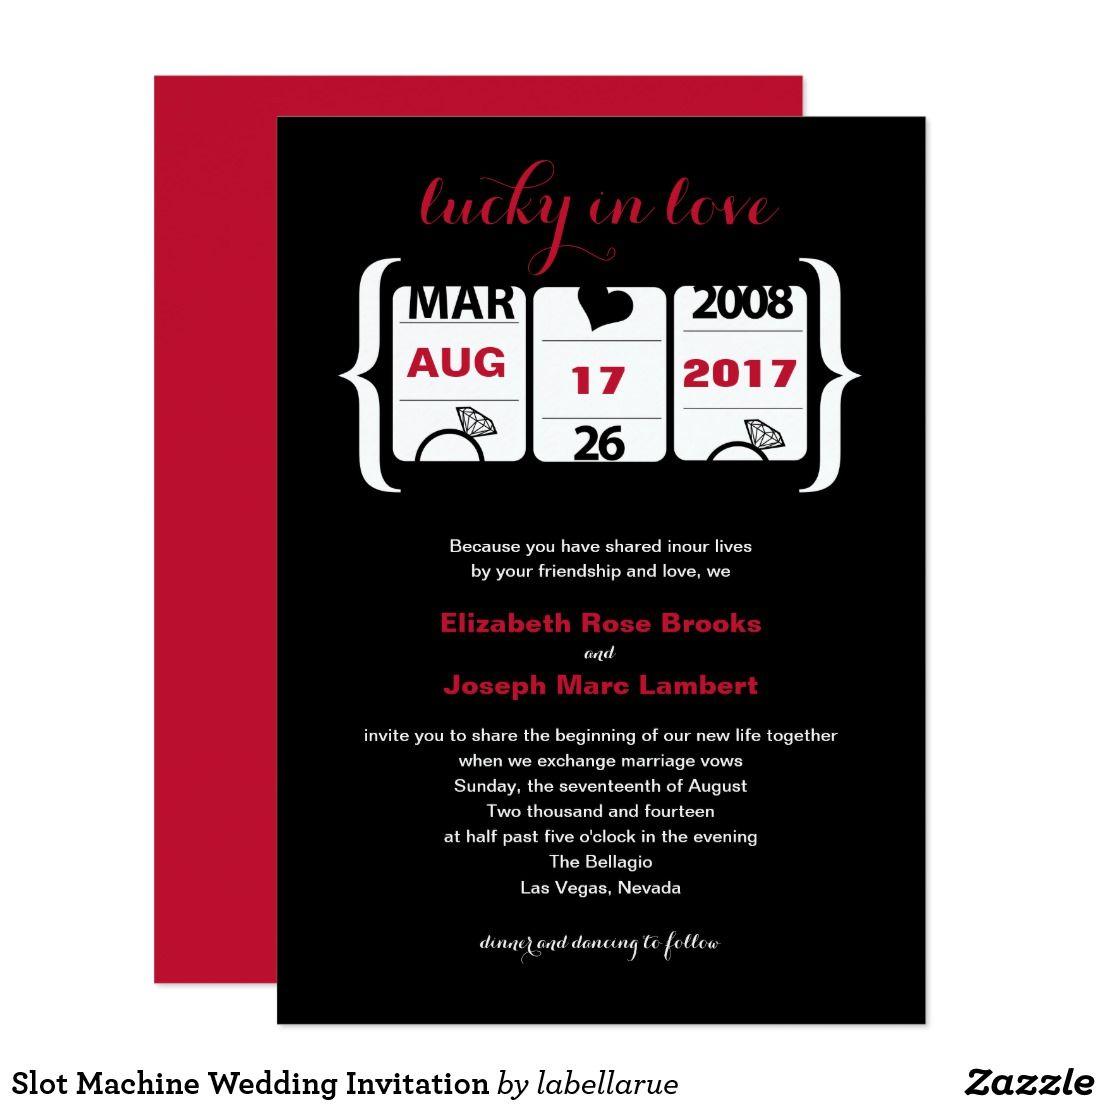 Slot Machine Wedding Invitation | Wedding : Destination | Pinterest ...